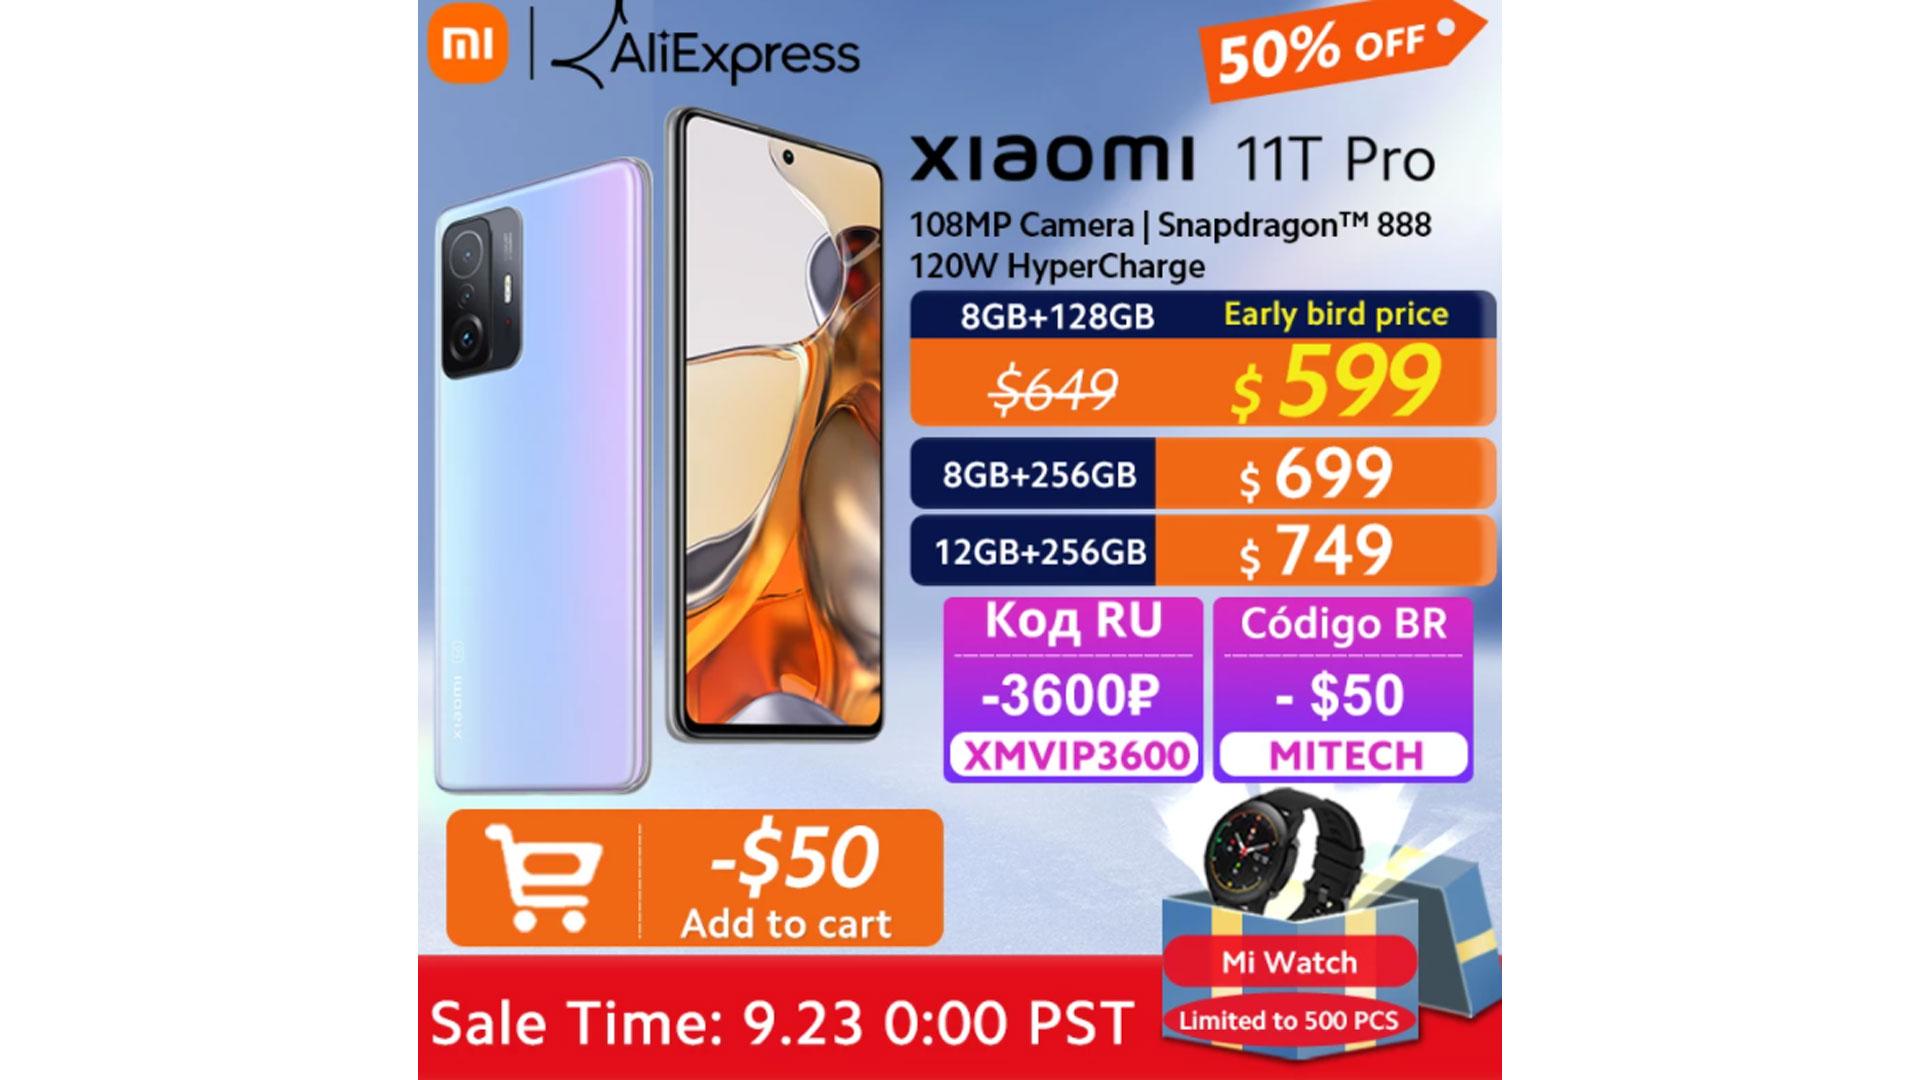 Xiaomi Mi 11t Pro Xiaomi 11T Pro Teléfono Xiaomi Smartphone Xiaomi Xiaomi 11T